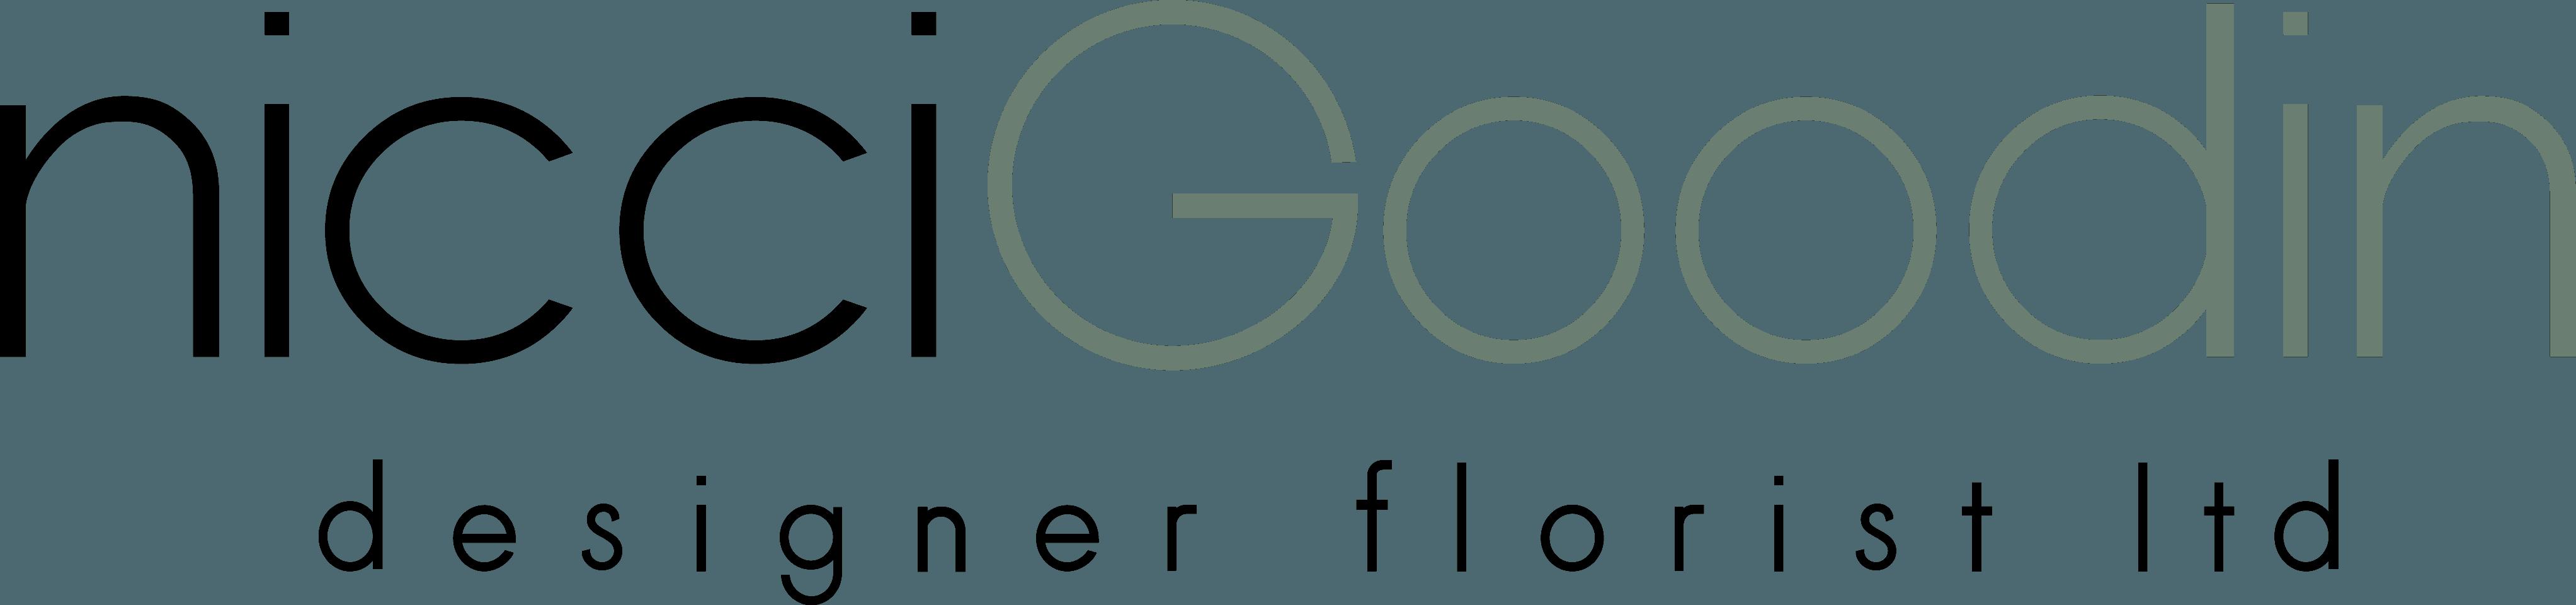 Nicci Goodin designer florist ltd